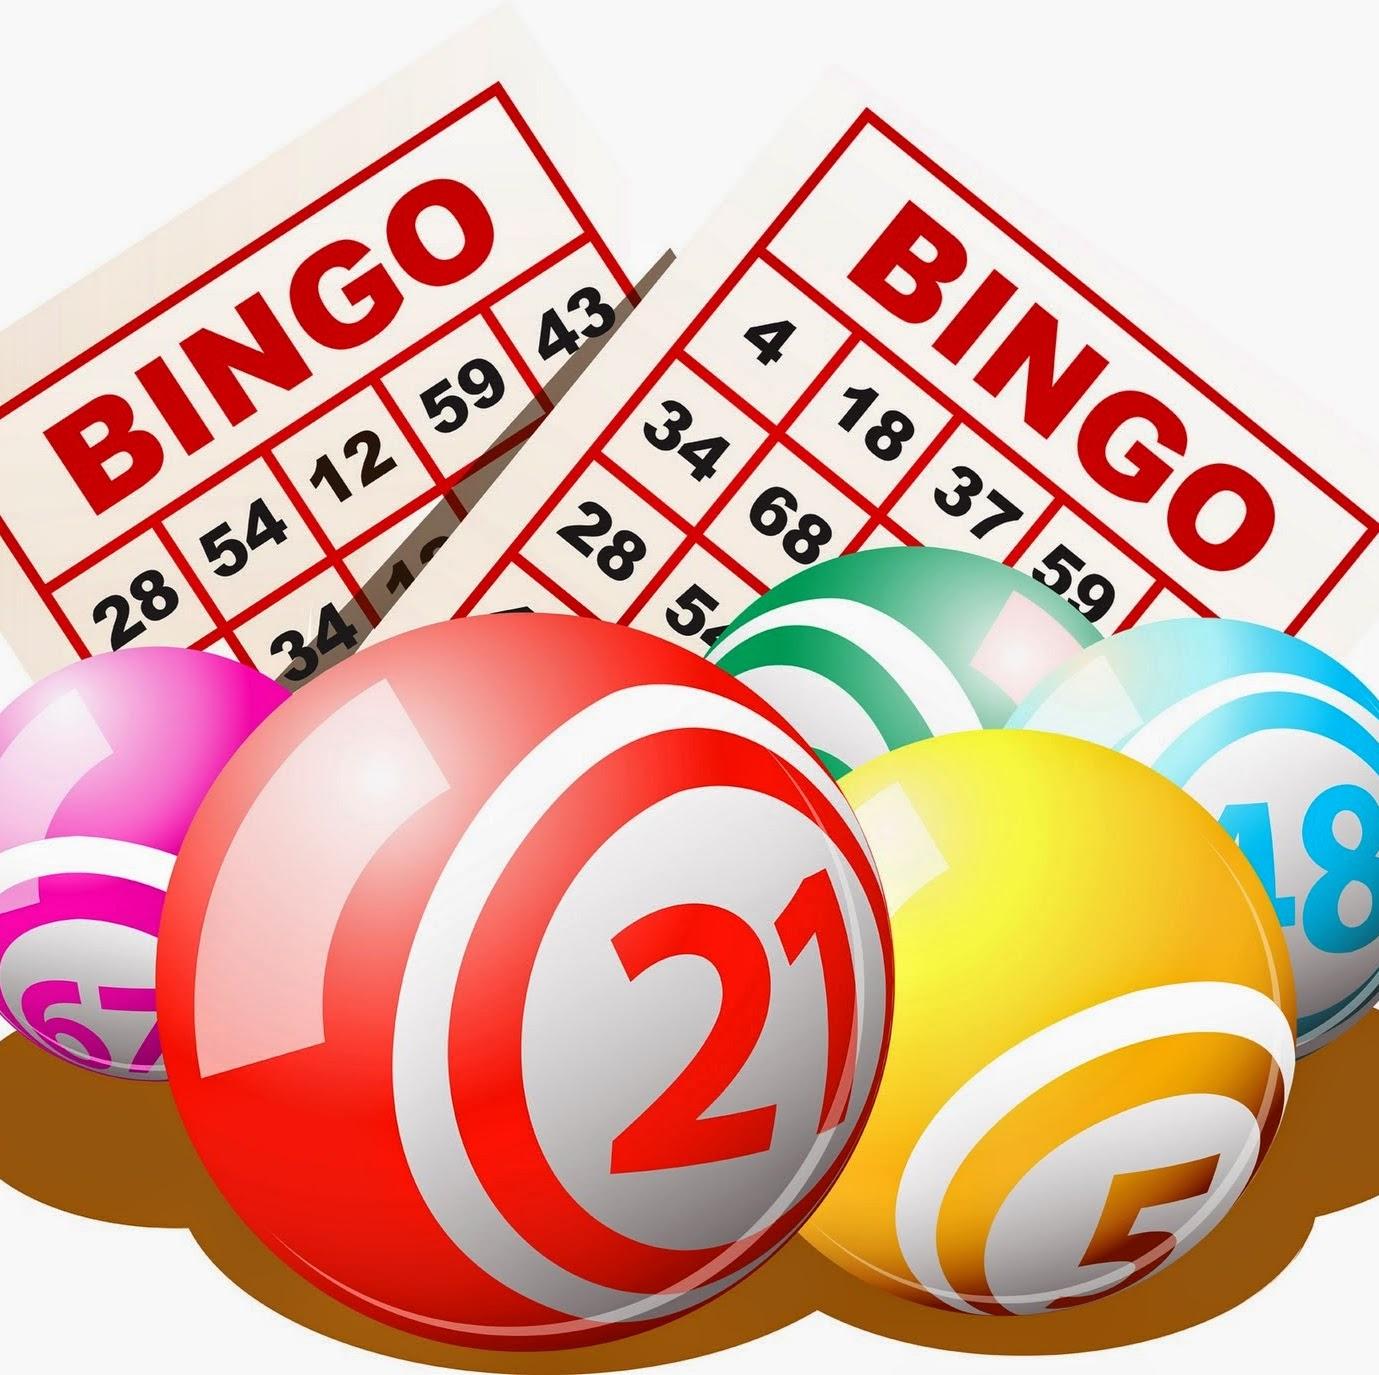 Free Bingo Balls Png, Download Free Clip Art, Free Clip Art on.